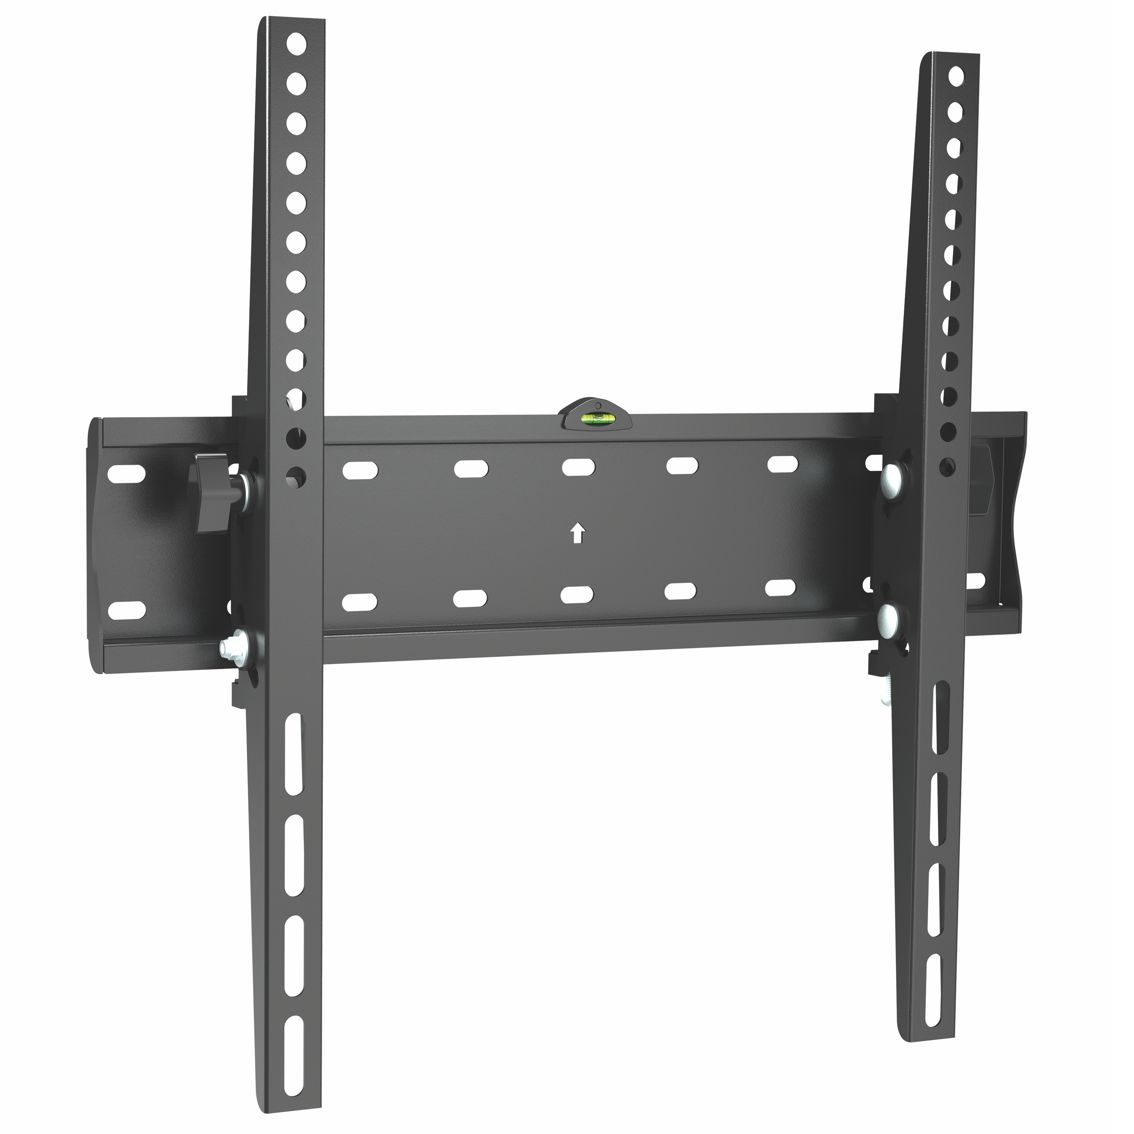 "Brateck βάση TV τοίχου, βαρέως τύπου, για LCD-TV 32""-55"", 40kg - BRATECK 10374"